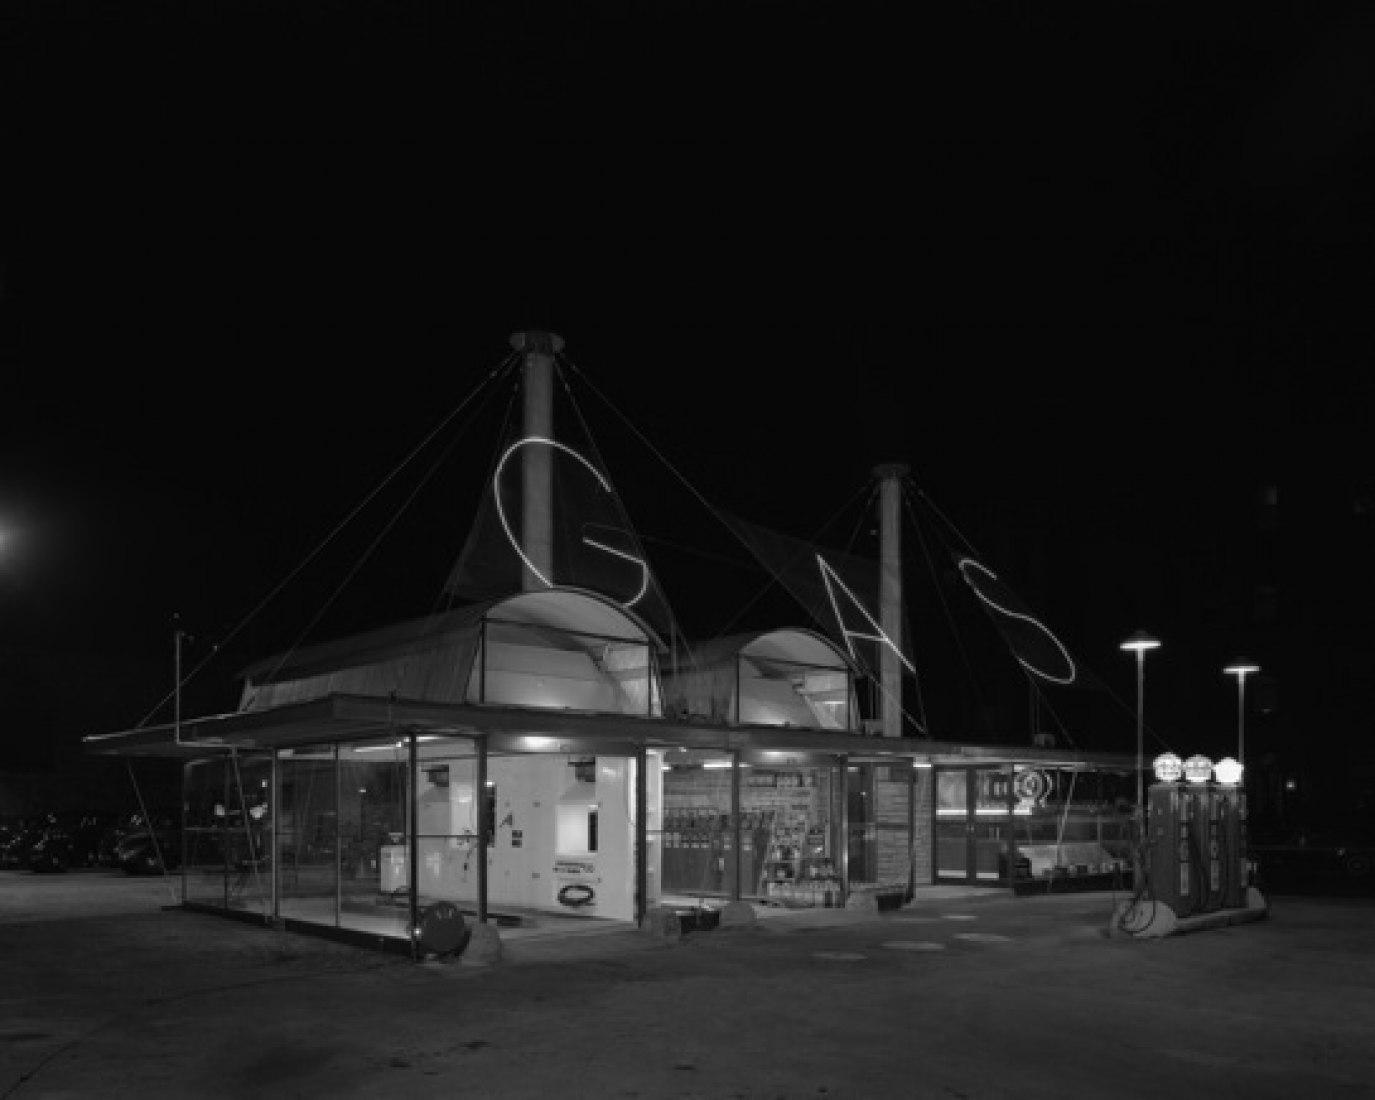 Fotografía: Clark-Maple Gasoline Service Station, Chicago, IL, 1938.  Hedrich Blessing, cortesía del Chicago History Museum.